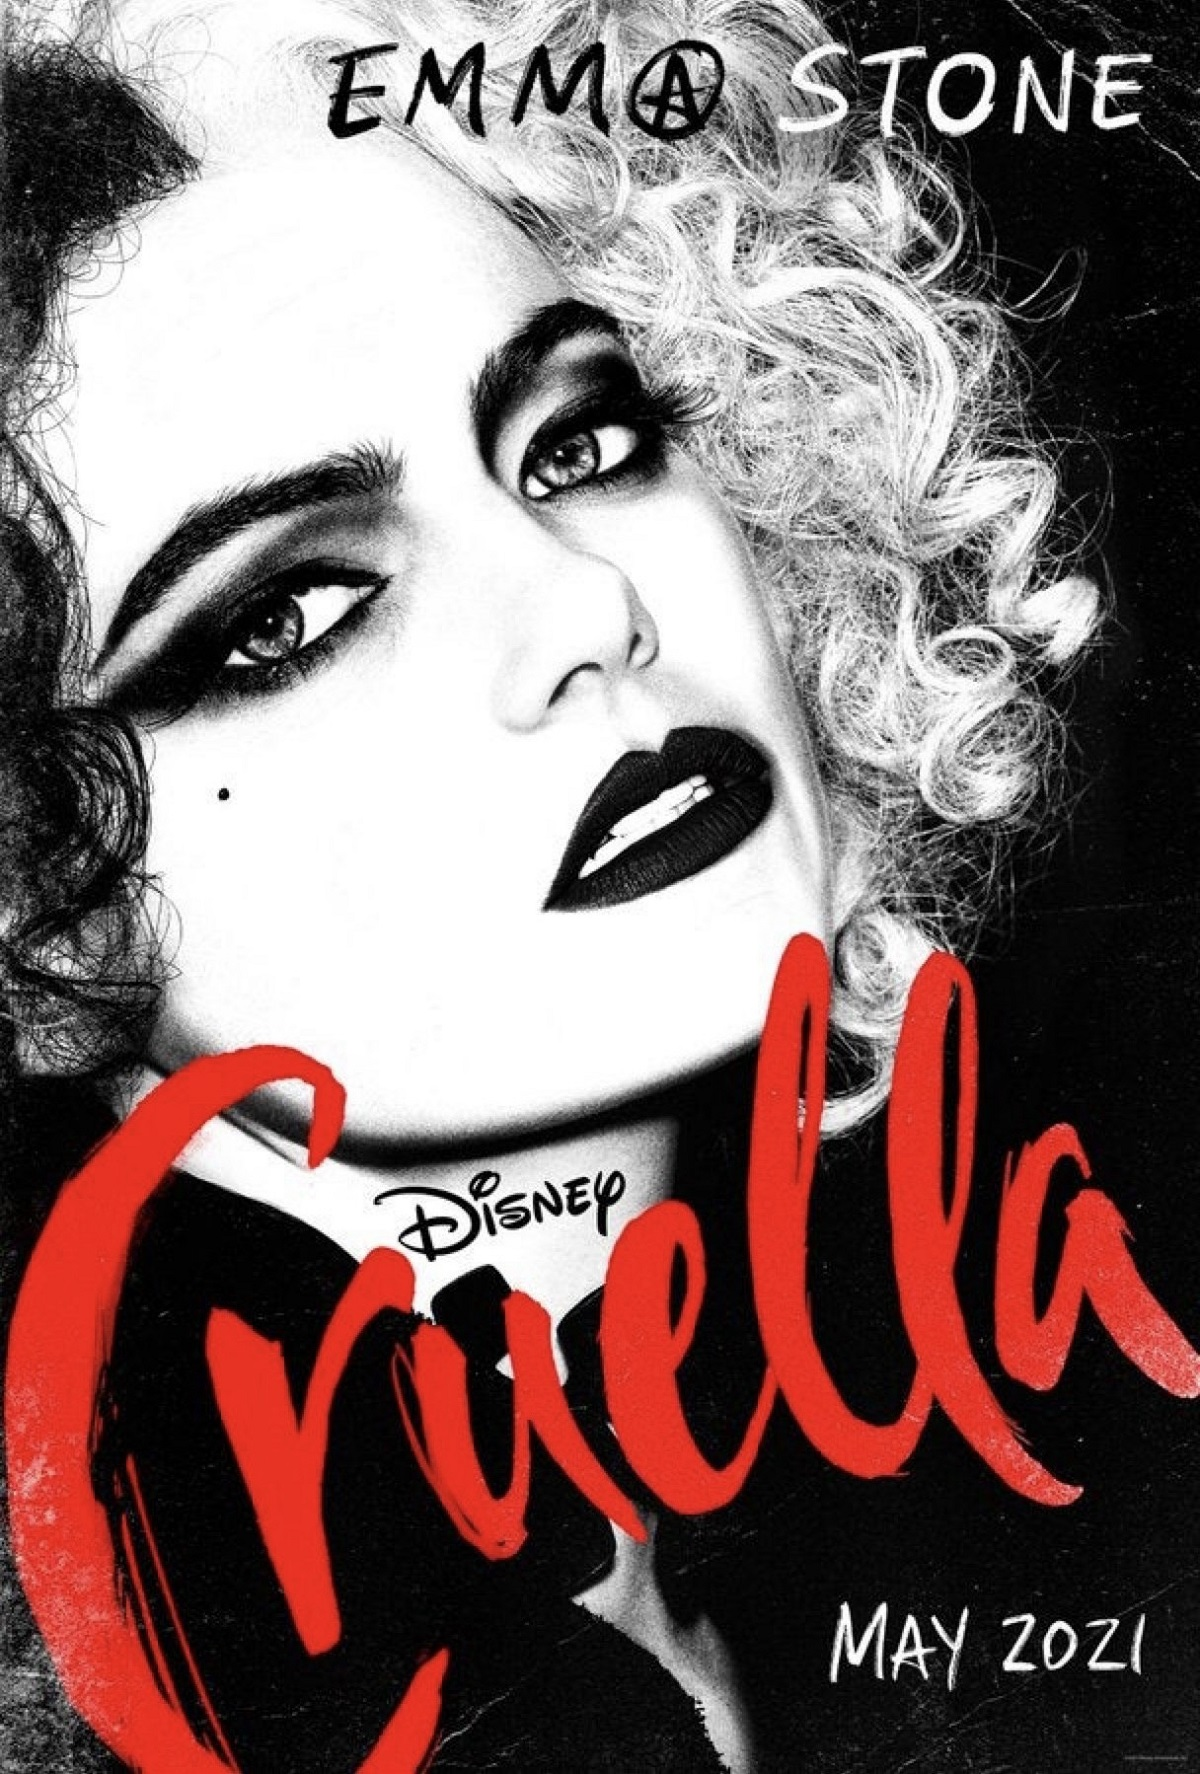 Emma Stone jako Cruella De Mon na nowym plakacie filmu Cruella